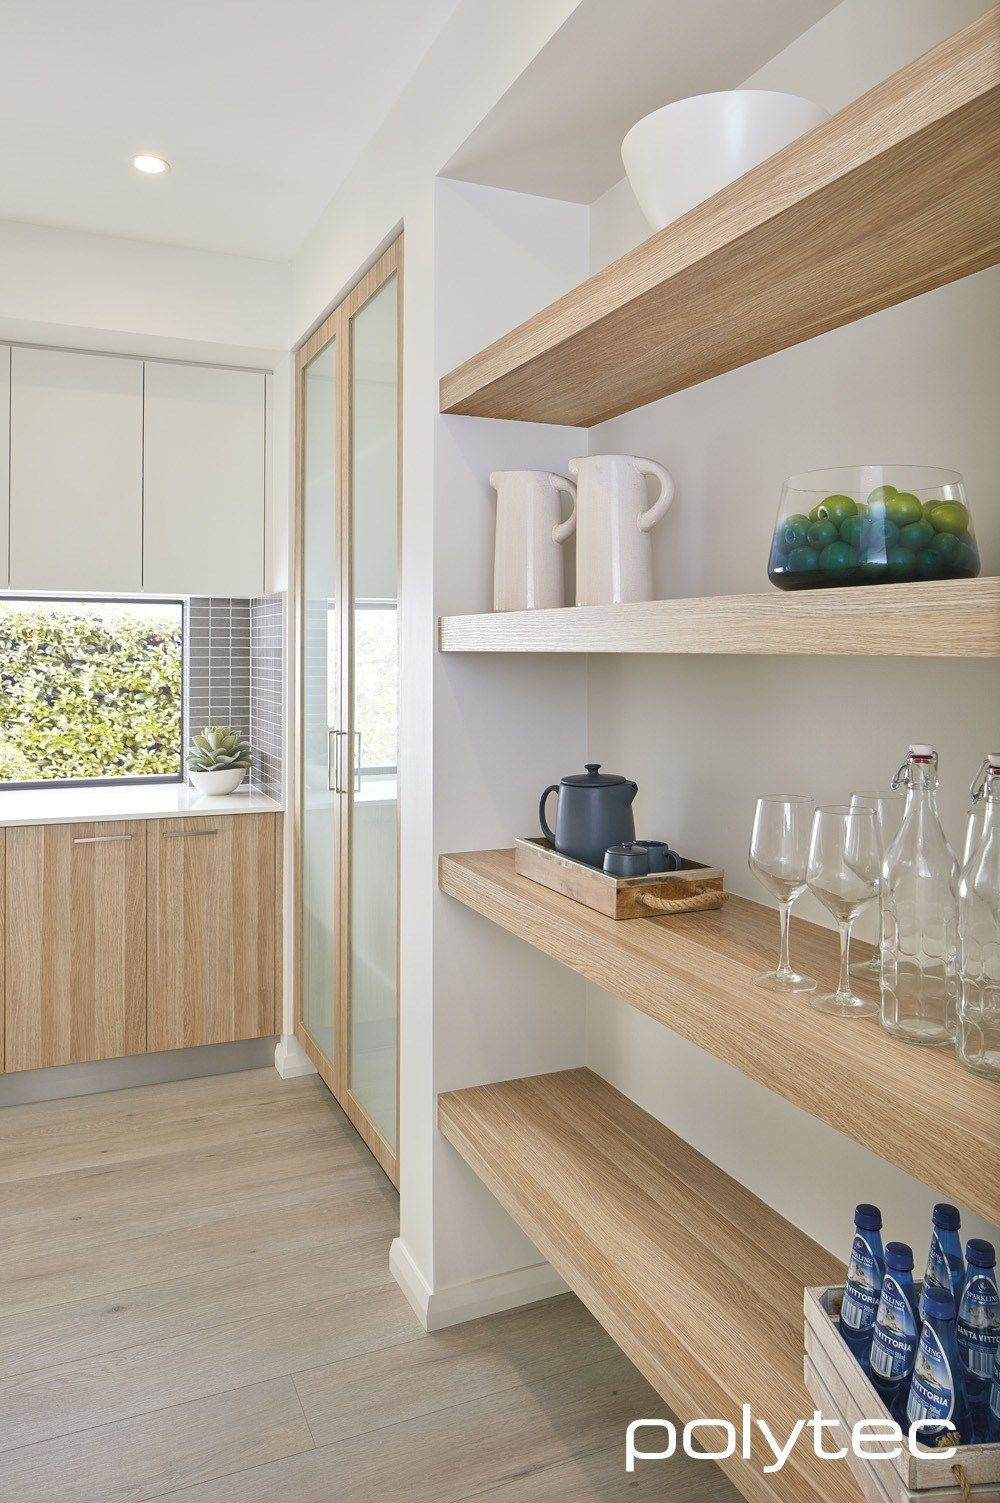 Shelving Base And Pantry Doors In Ravine Natural Oak Overhead Doors In Melamine Classic White